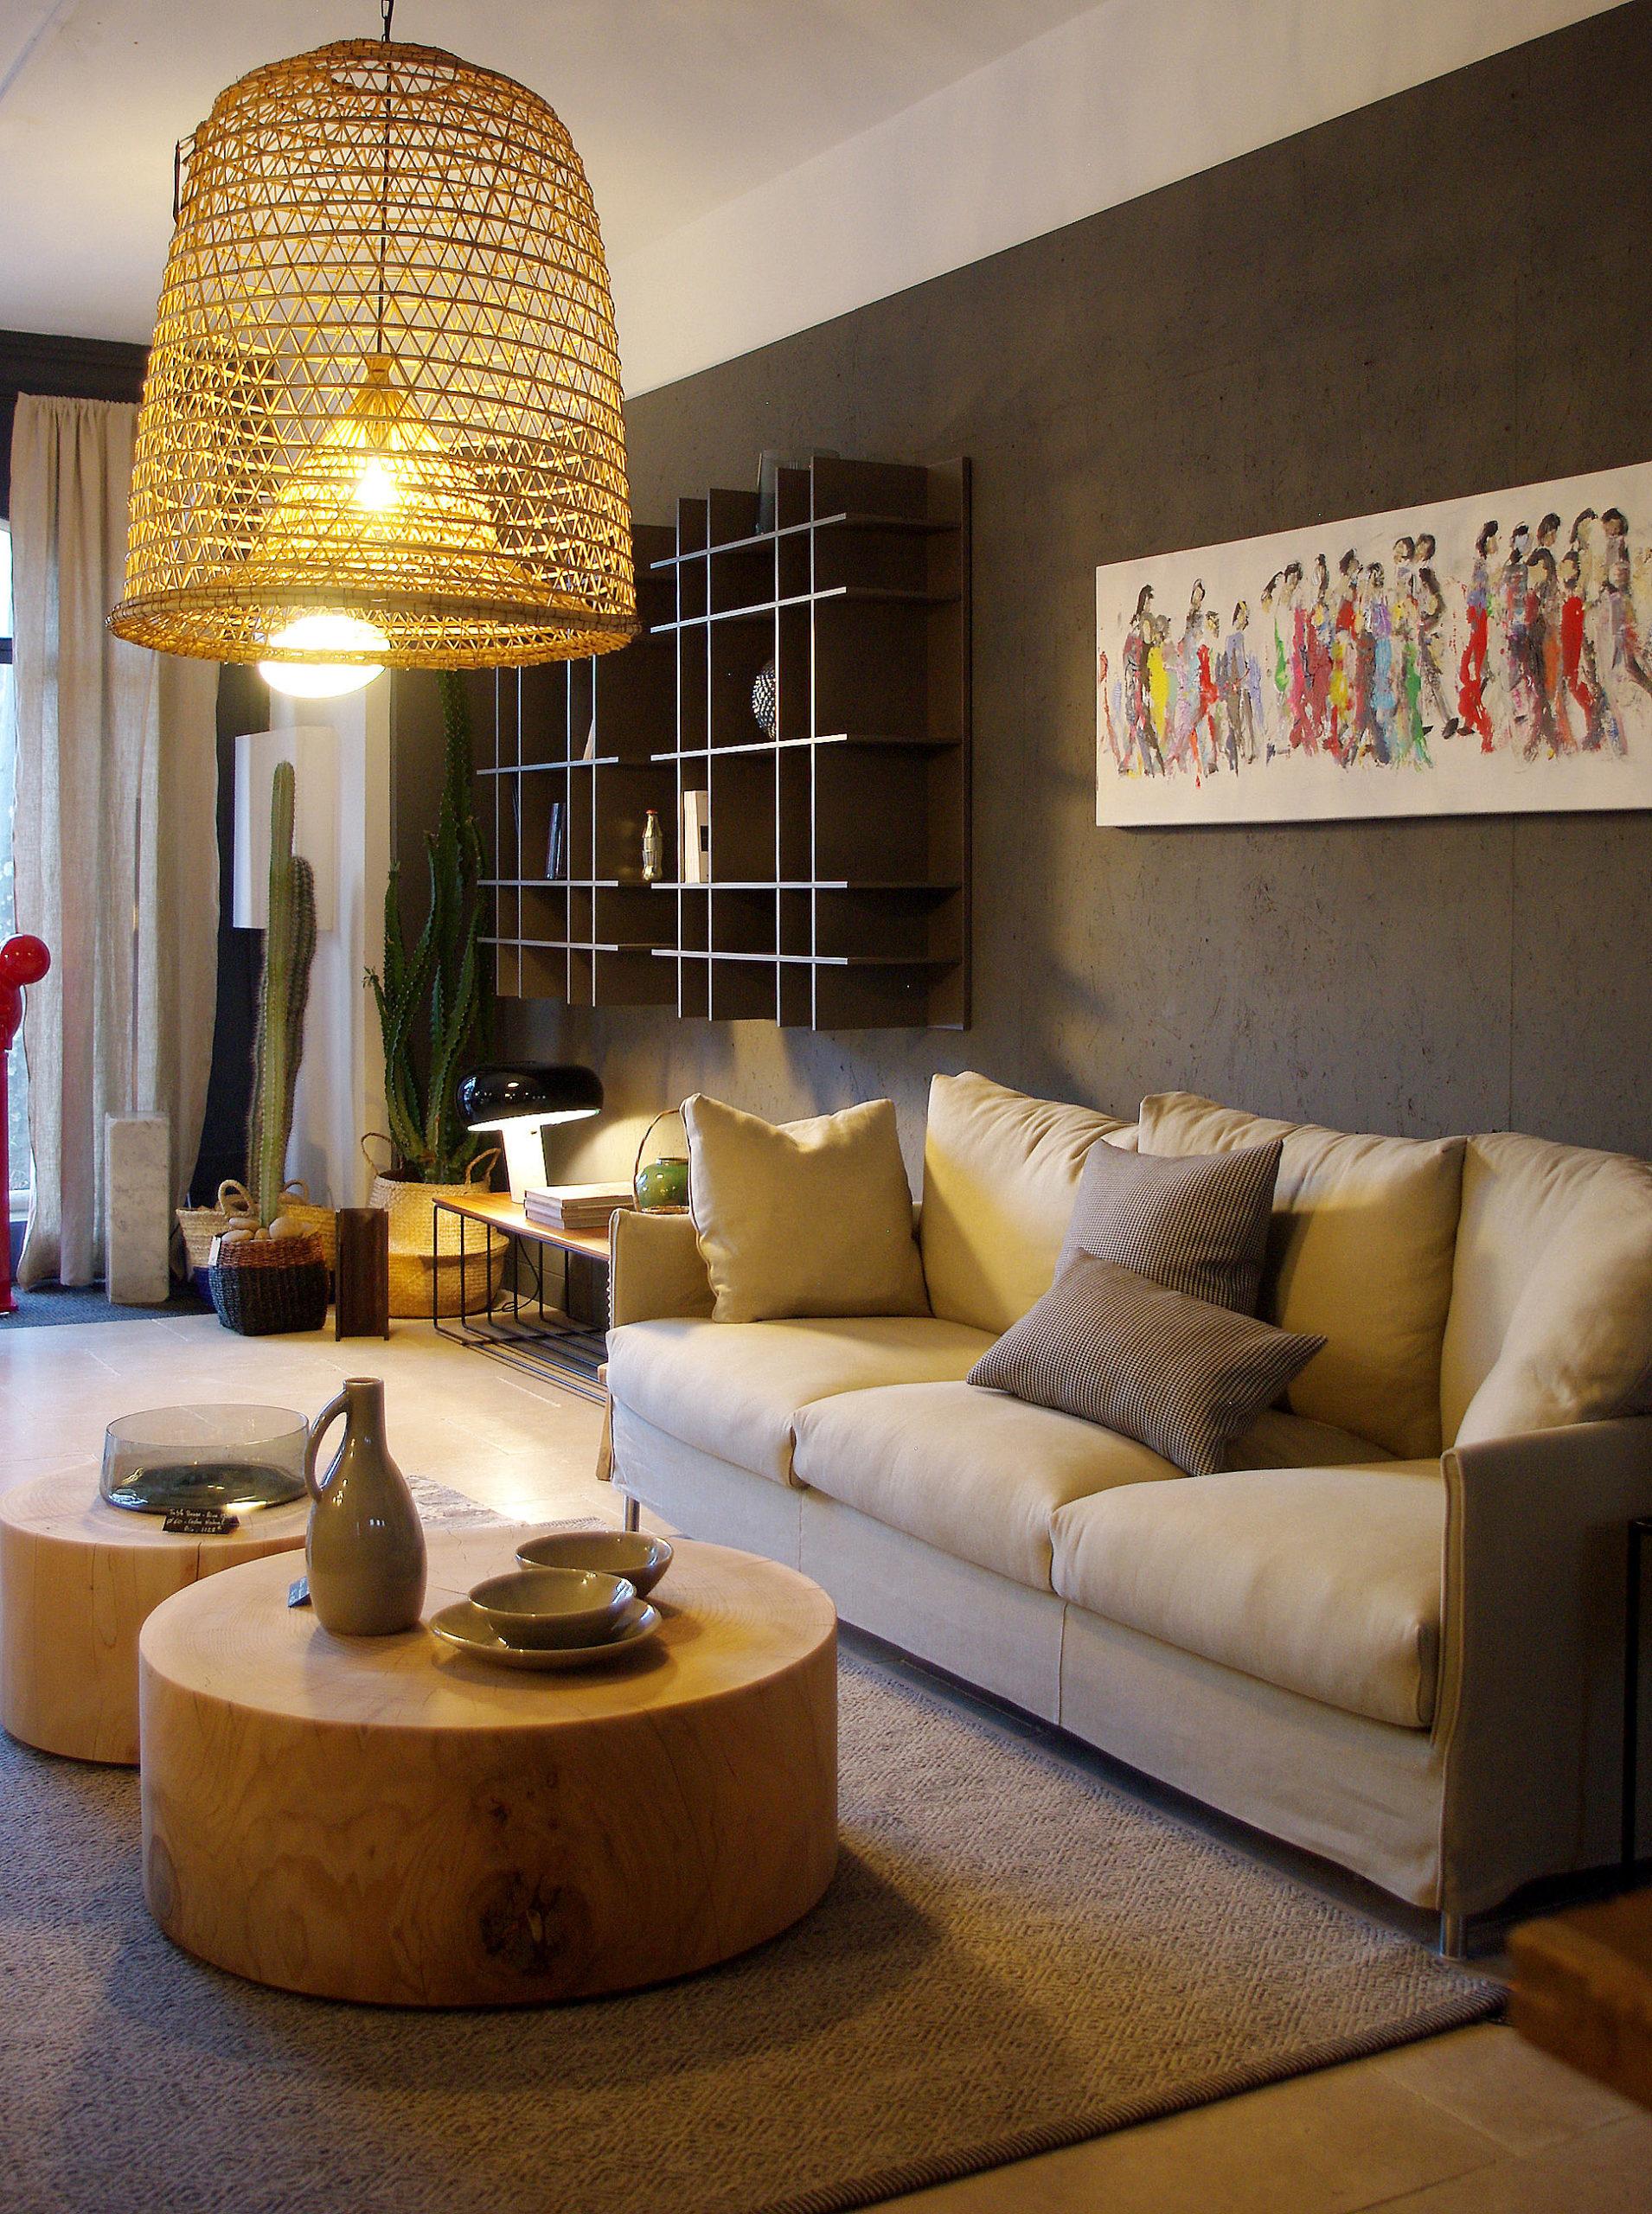 https://amelie-bouchez.fr/wp-content/uploads/2020/11/amelie-bouchez-showroom-decoration-stremydeprovence-2-scaled.jpg